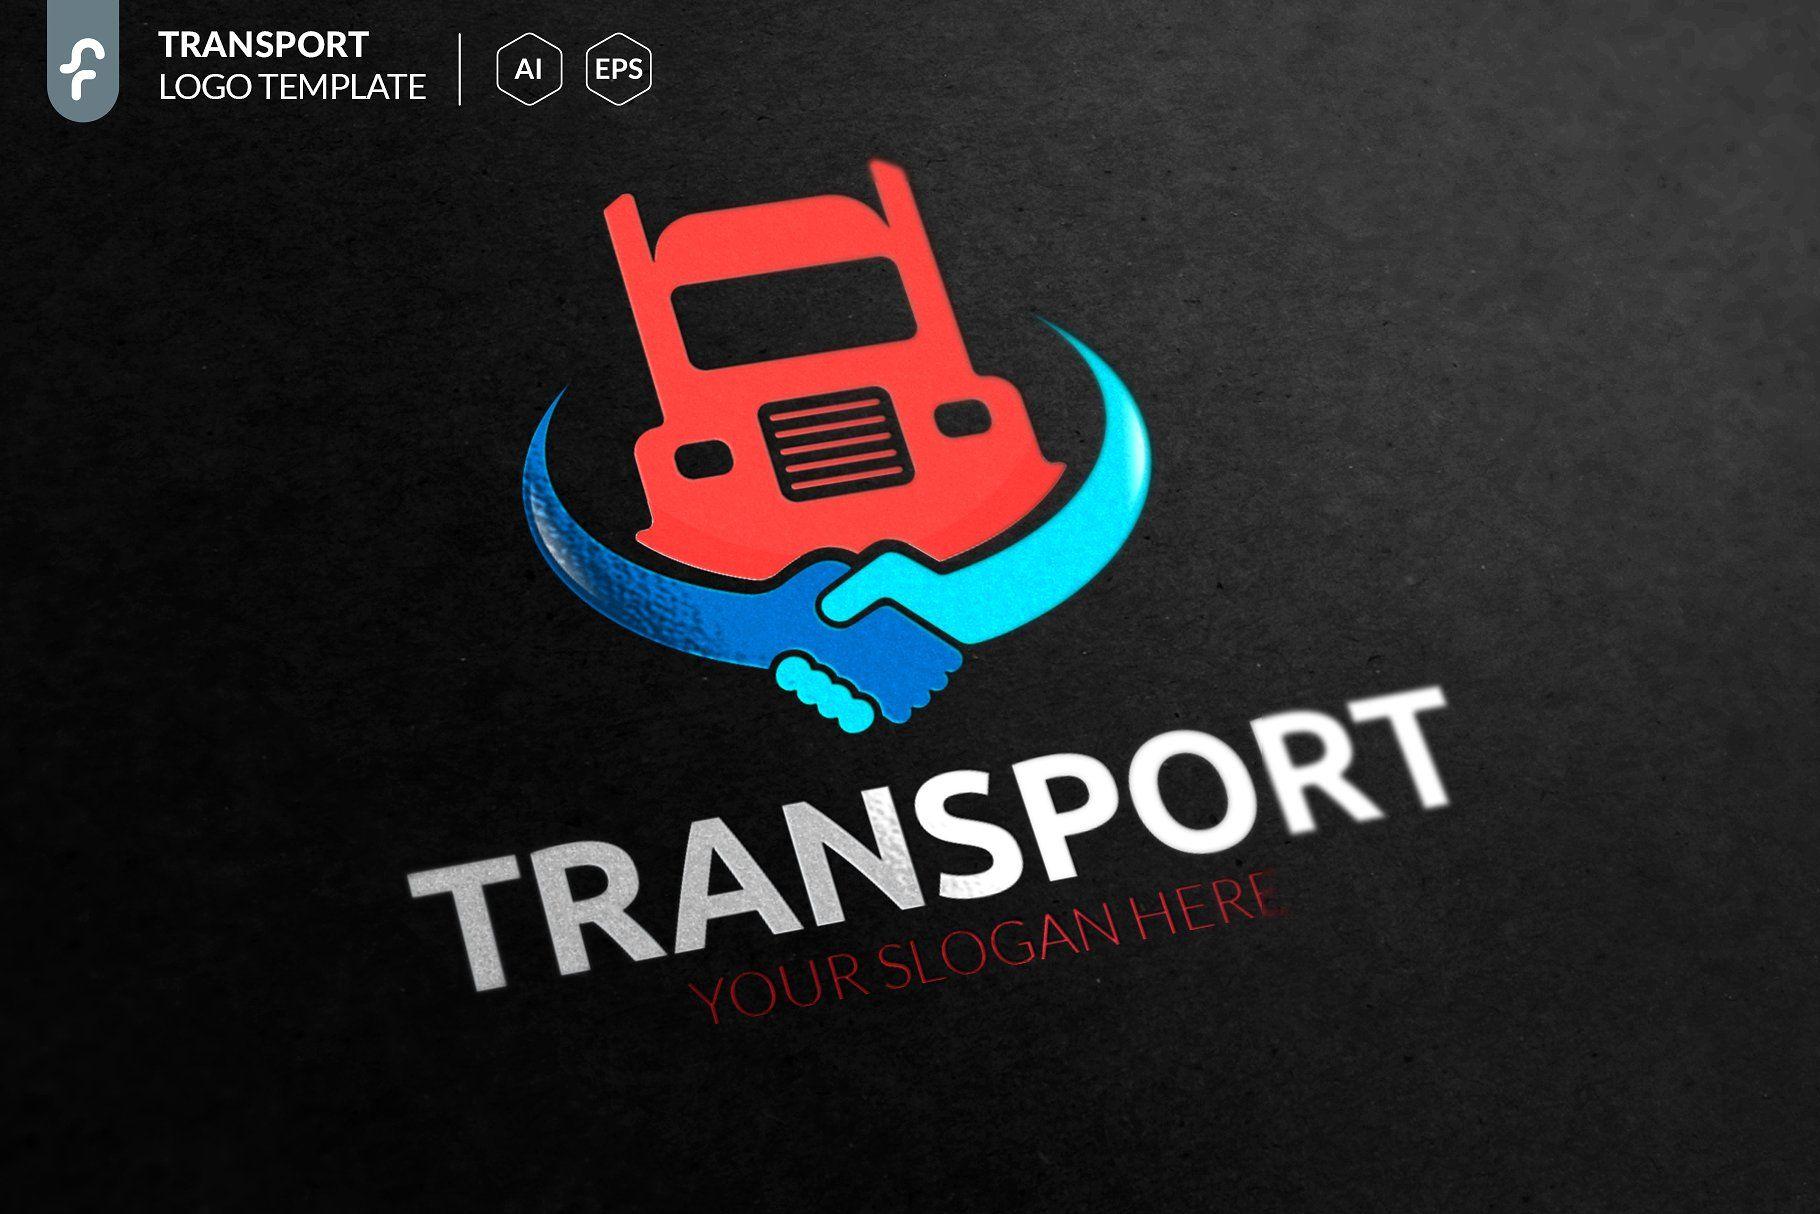 Transport Truck Logo Truck Transport Templates Logo Templates Logo Design Logo Templates,Best Mouse For Graphic Design